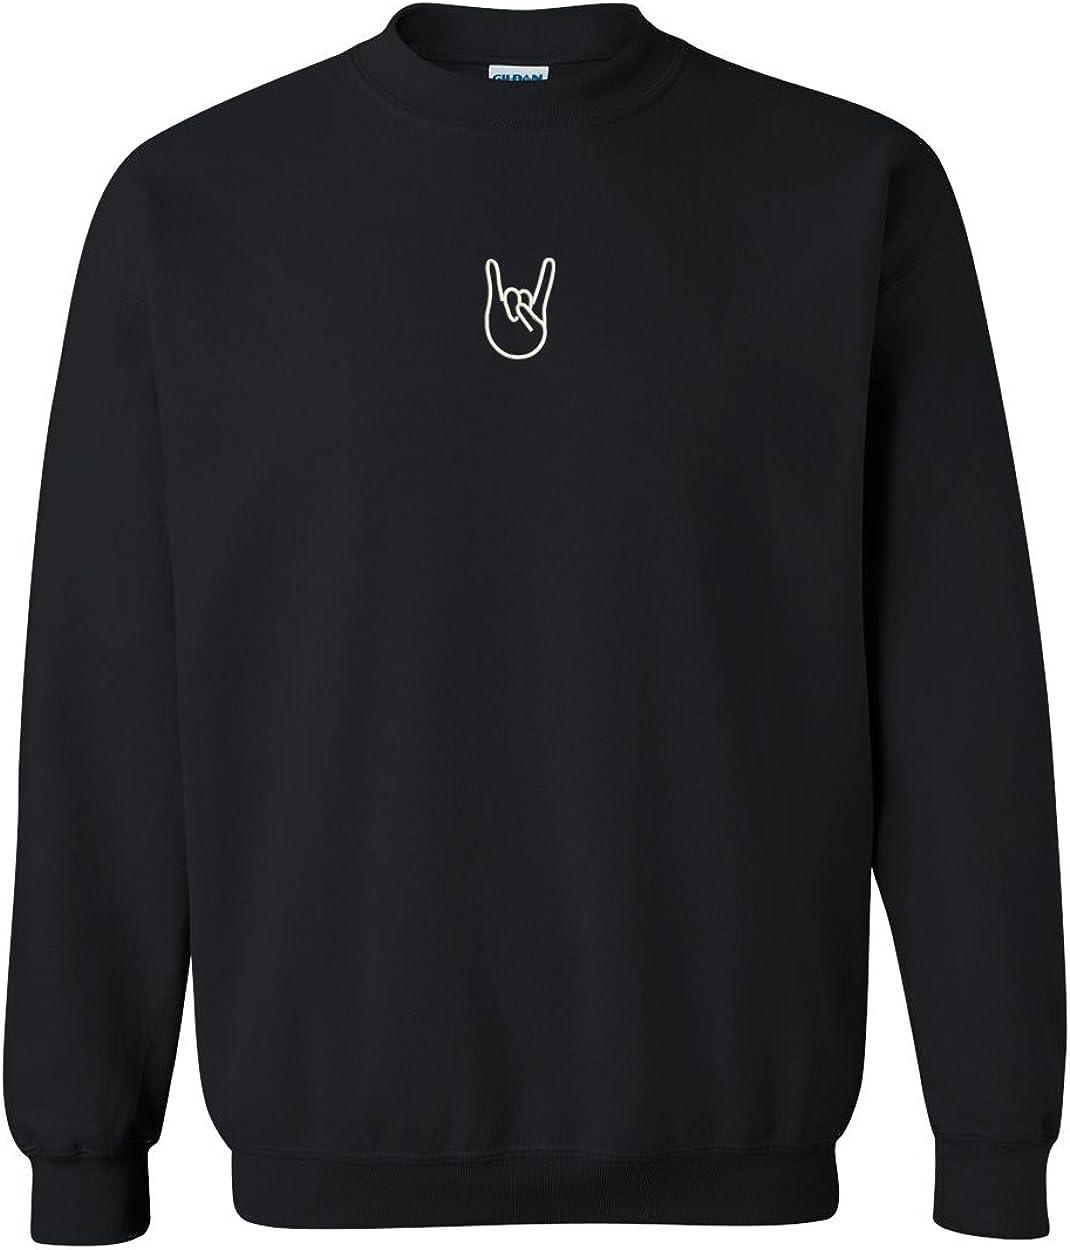 Trendy Apparel Shop Rock On Embroidered Crewneck Sweatshirt